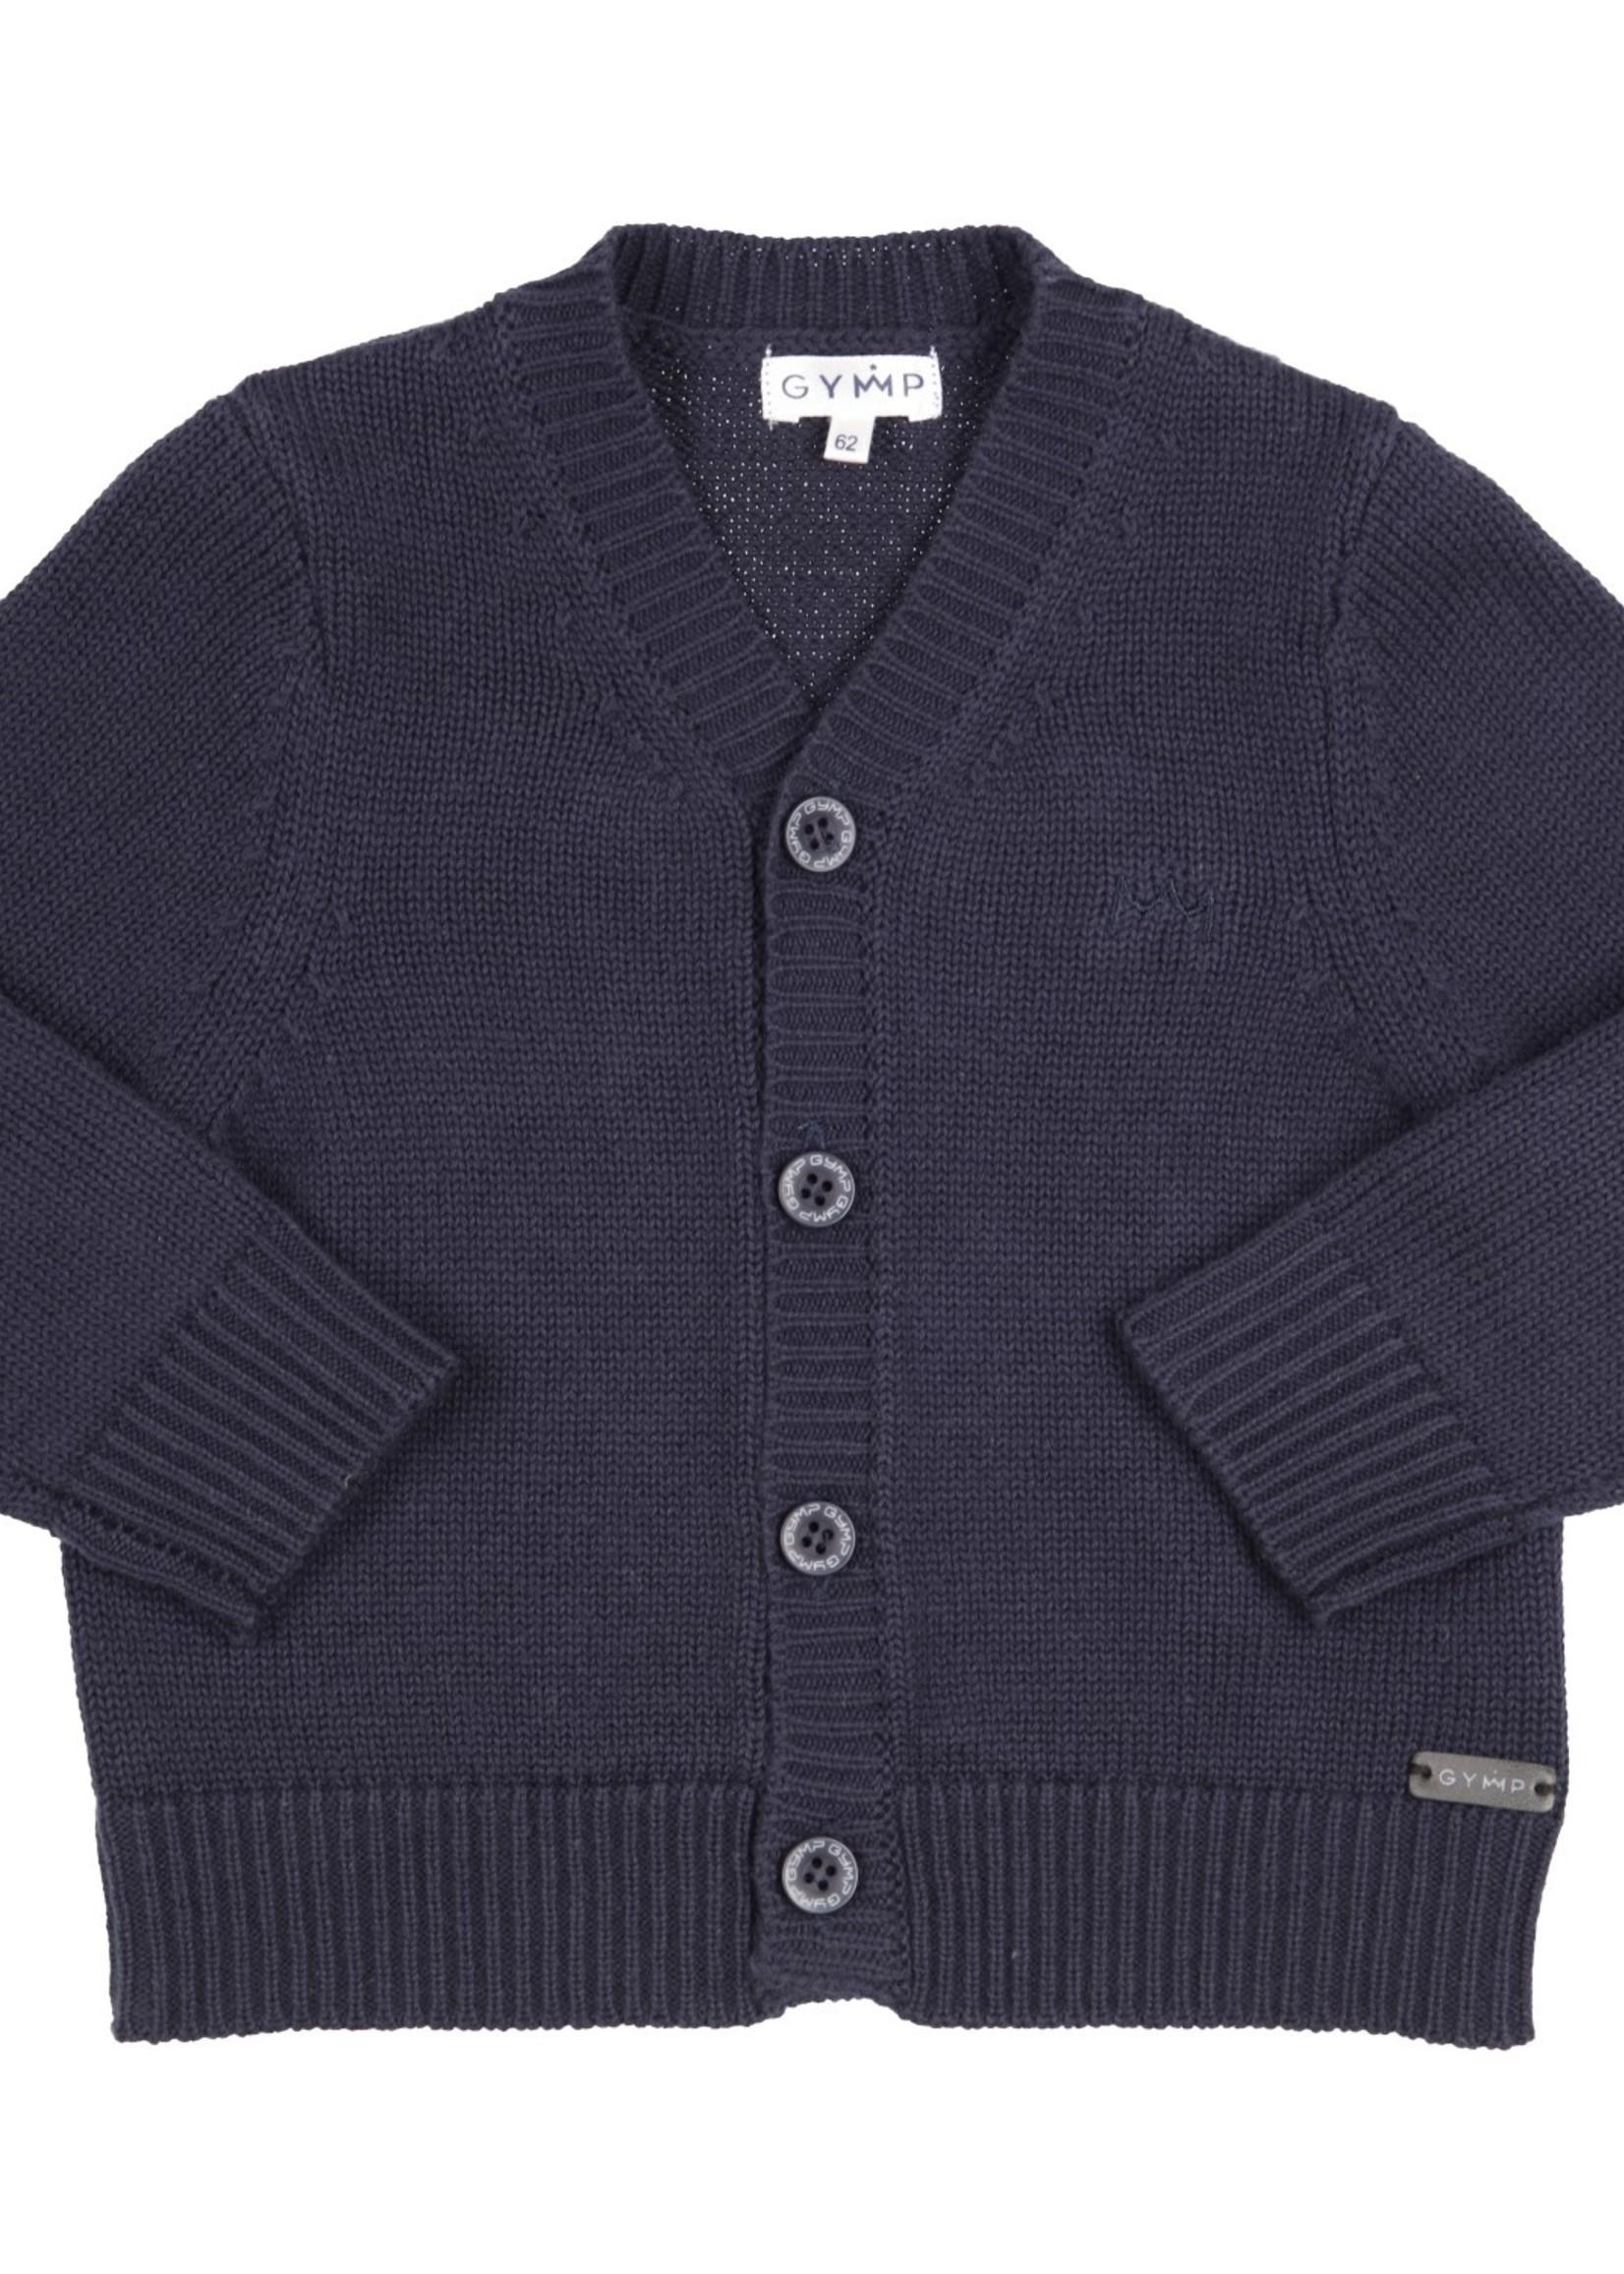 Gymp Gymp knitted cardigan marine